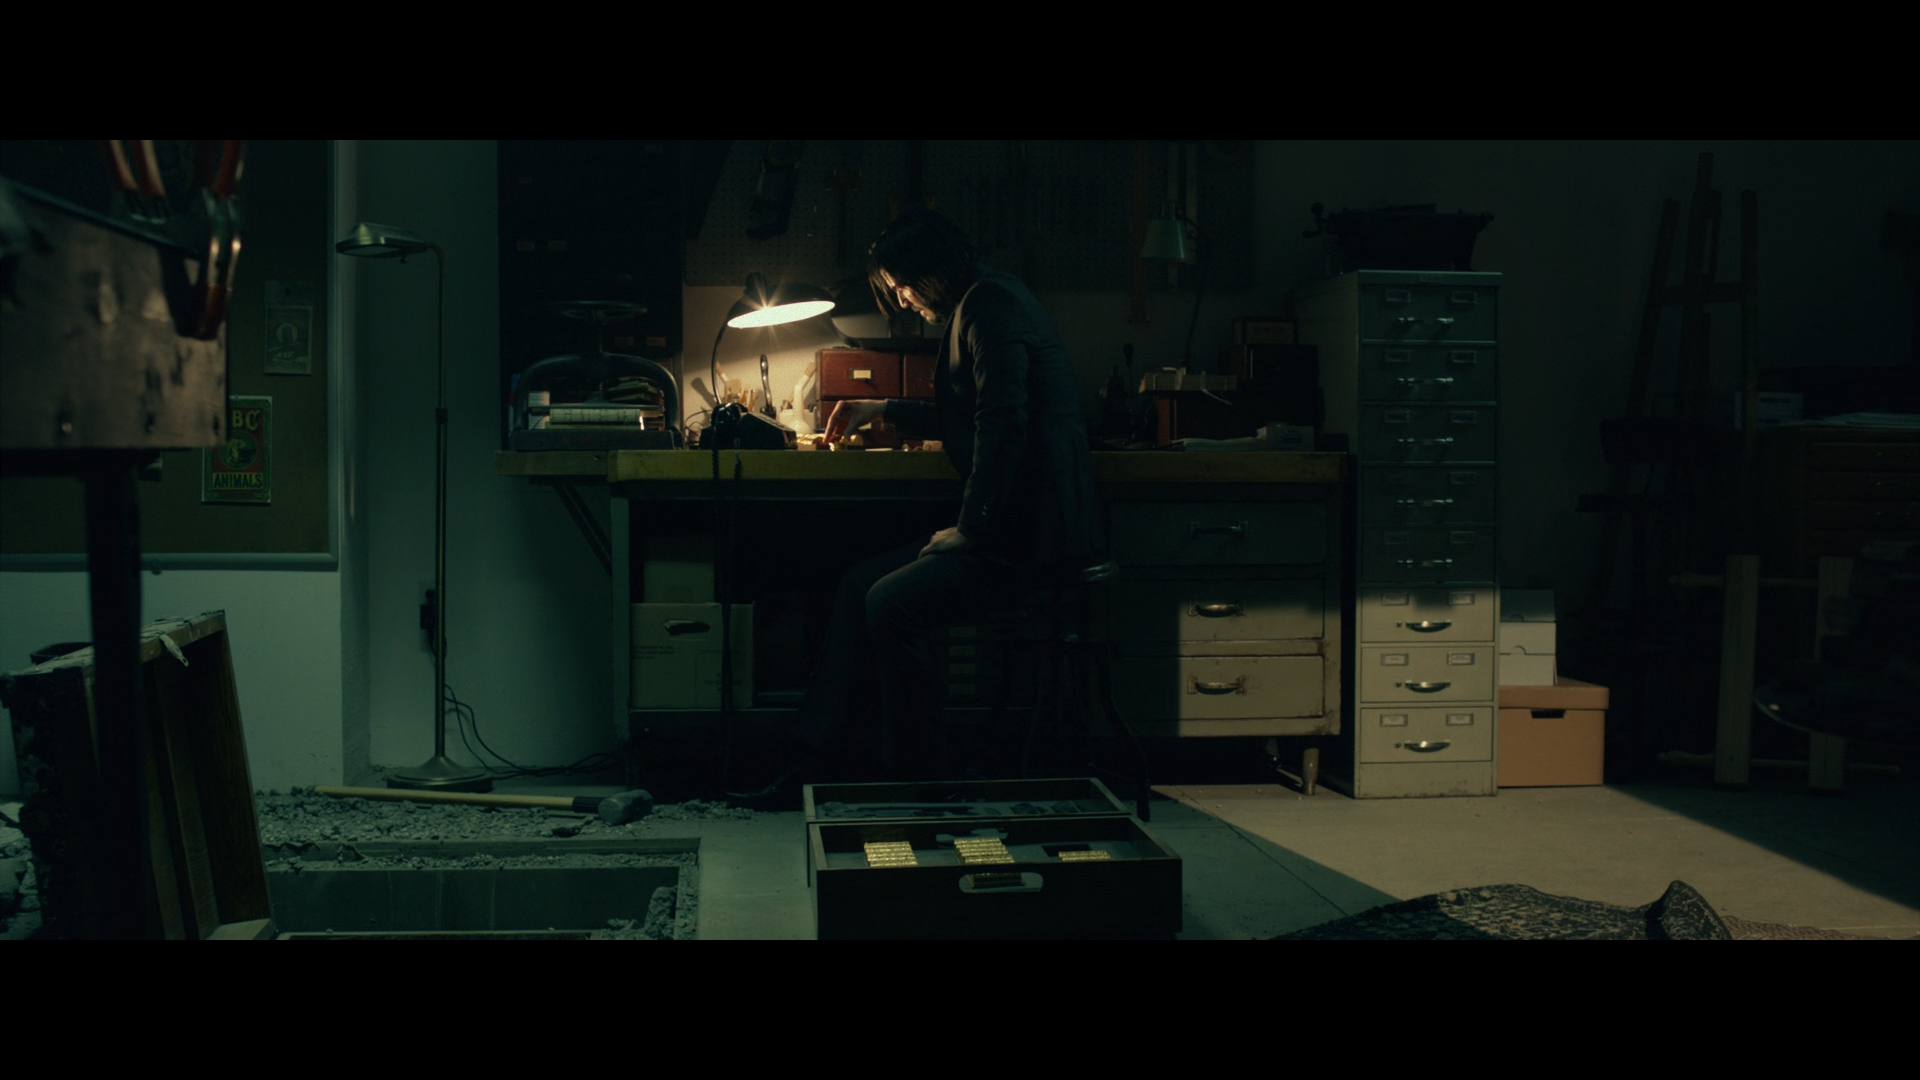 John Wick 2014 1080p Blu Ray 10bit x265 DTS Dr3ad Lo X mkv snapshot